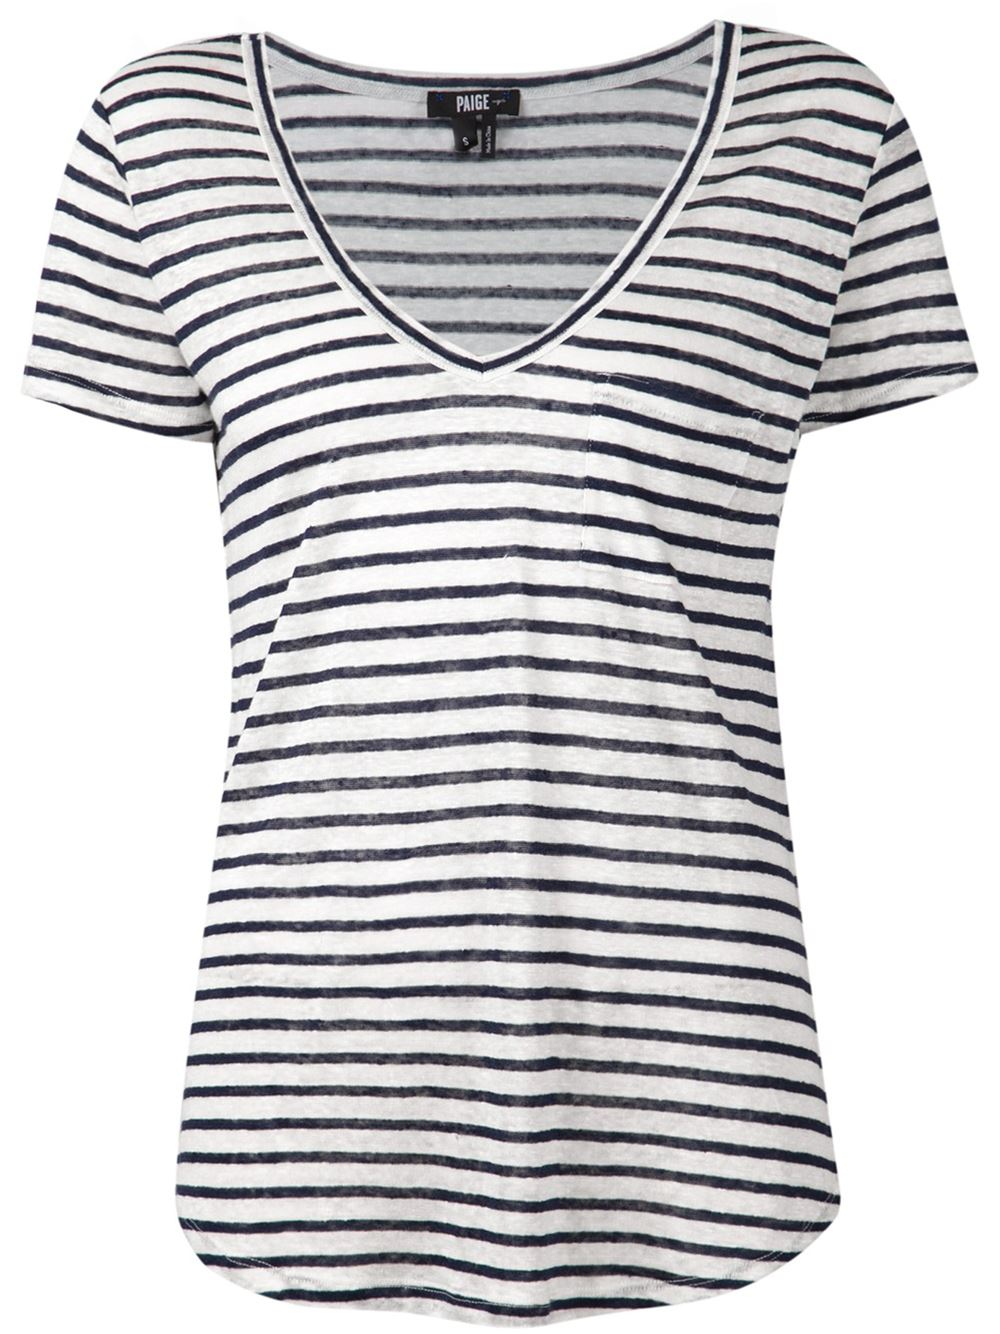 Paige 39 Lynnea 39 Striped T Shirt In Black White Lyst